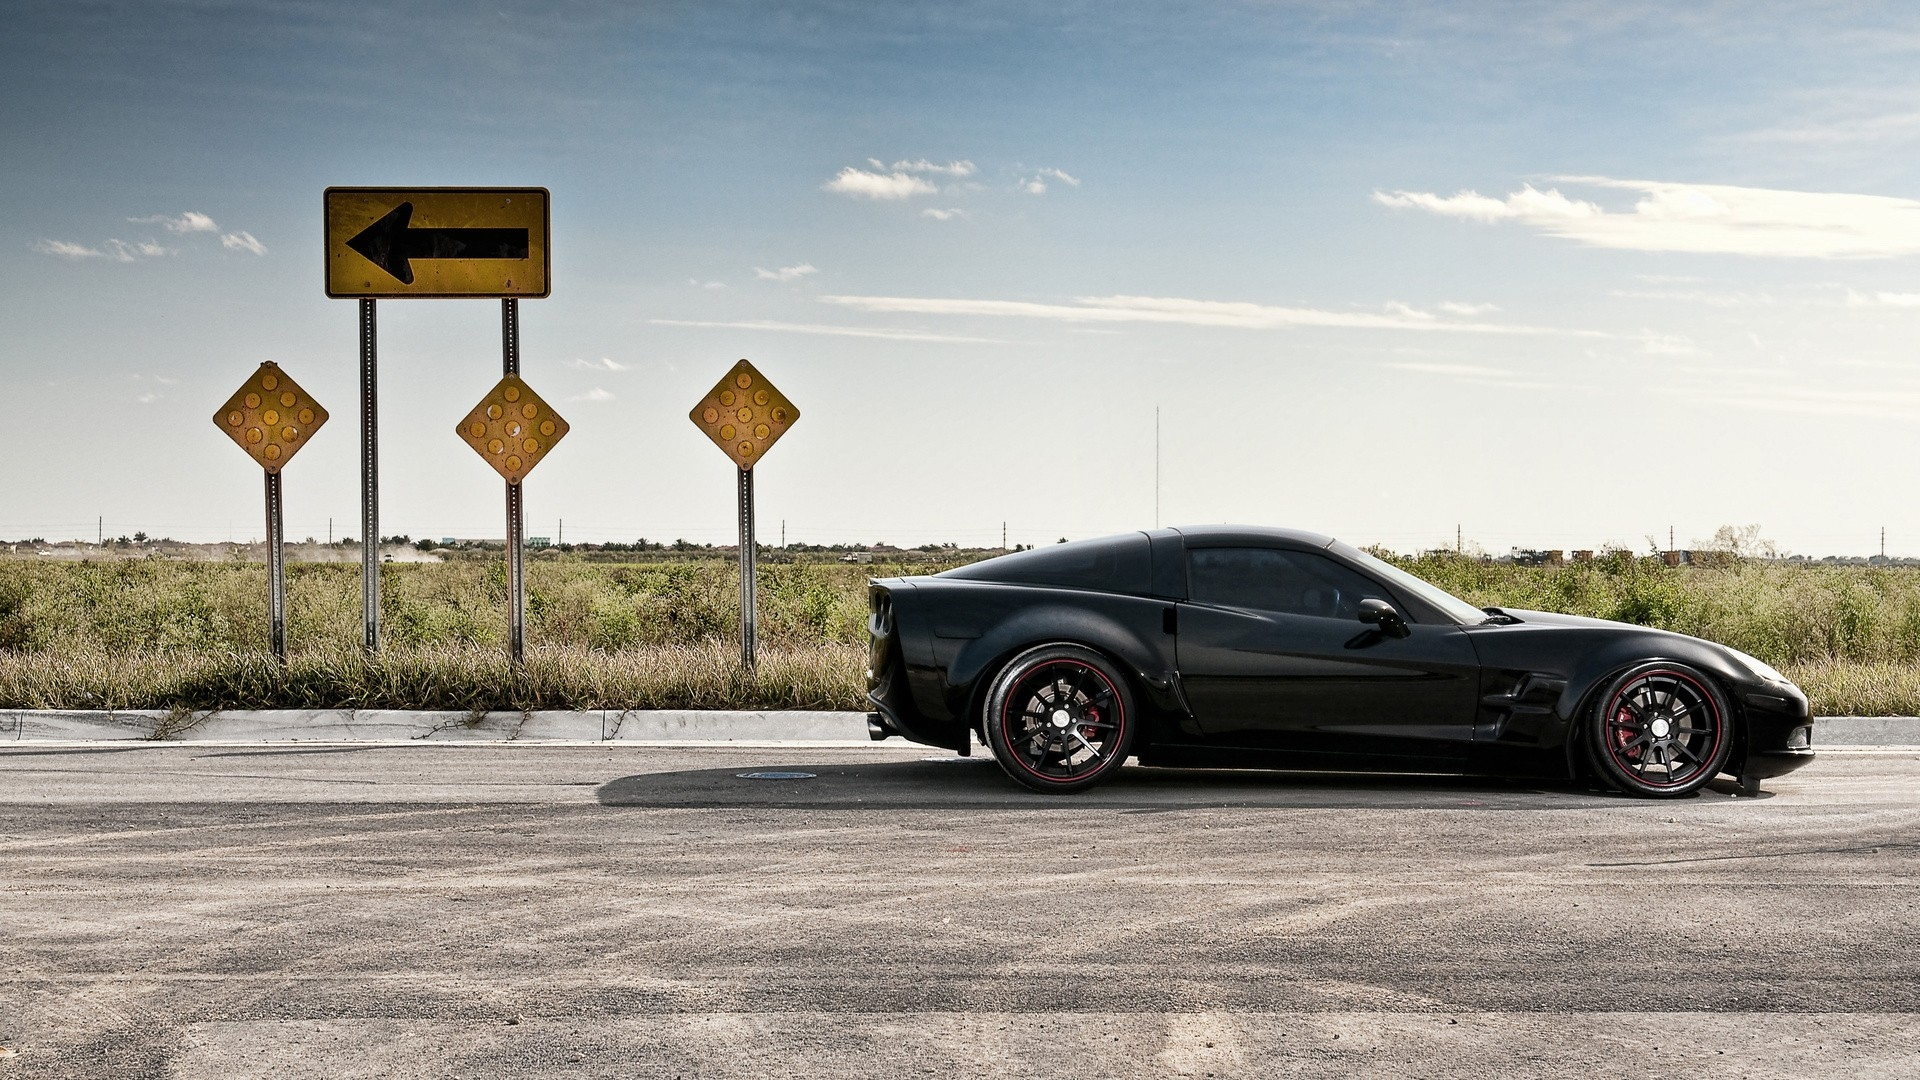 Download Wallpaper 1920x1080 road, traffic, auto, black, corvette Full ...